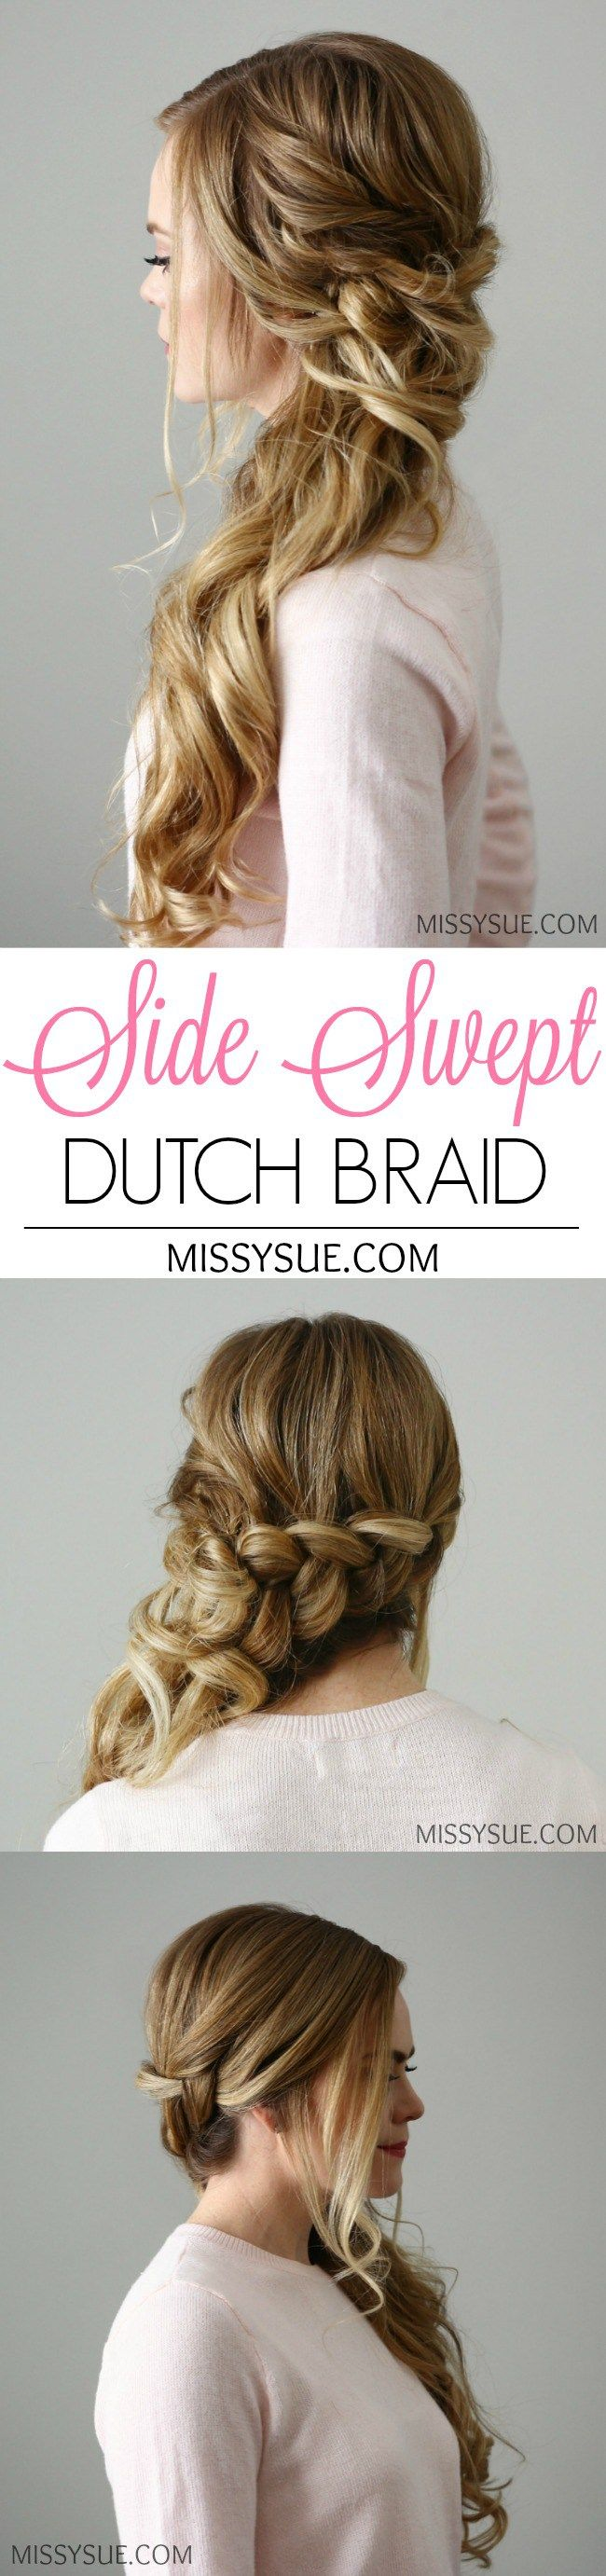 Side swept dutch braid dutch braids side swept and dutch